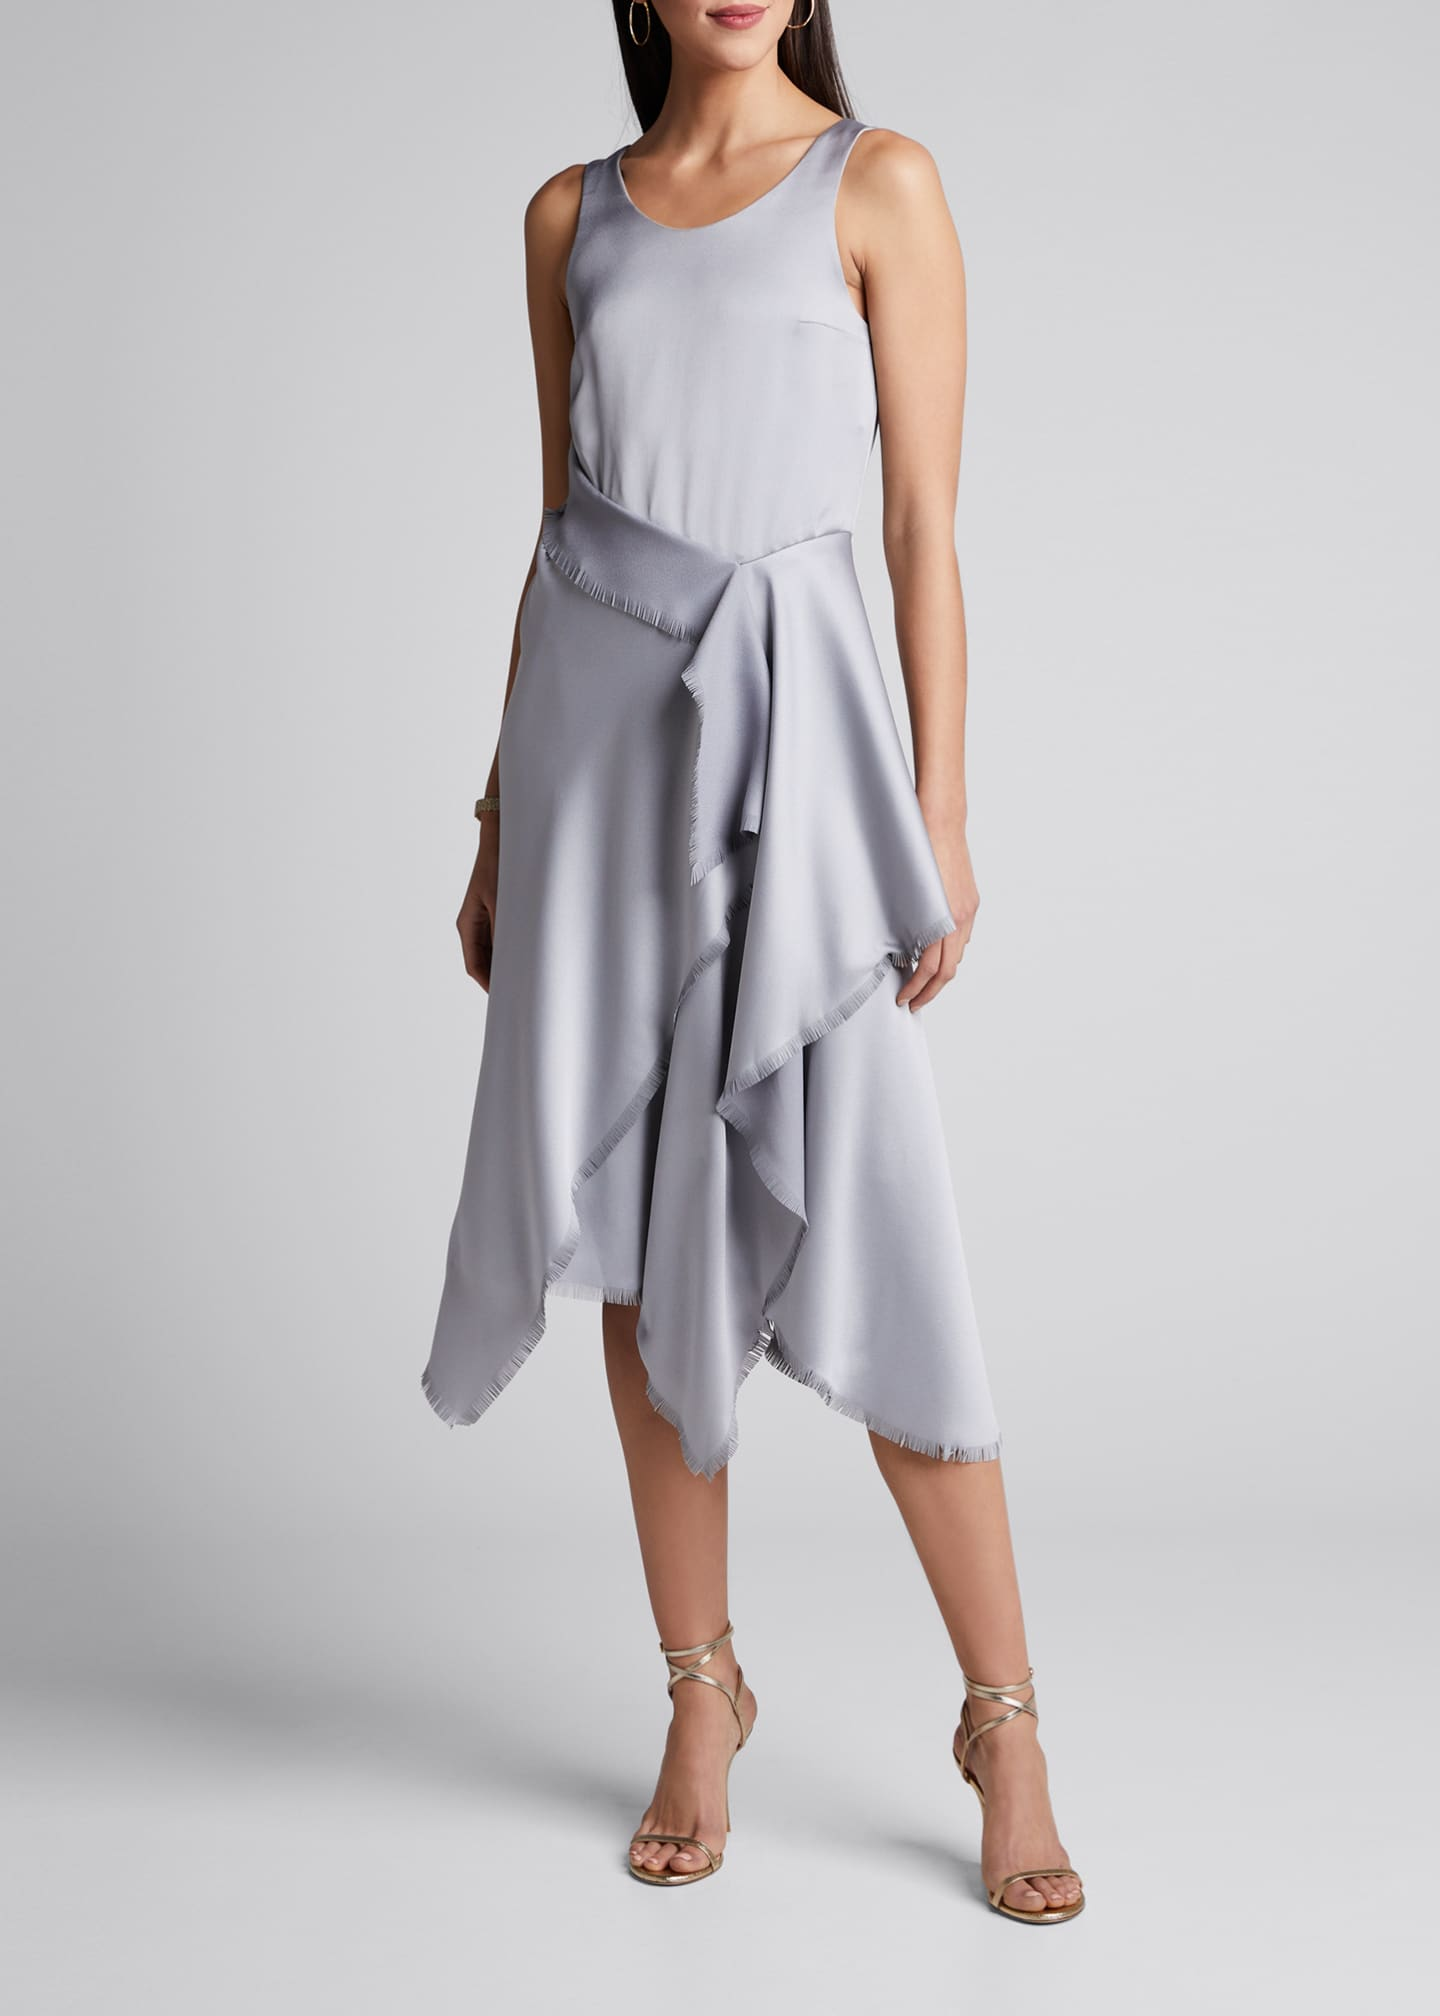 Cedric Charlier Satin Asymmetric Dress